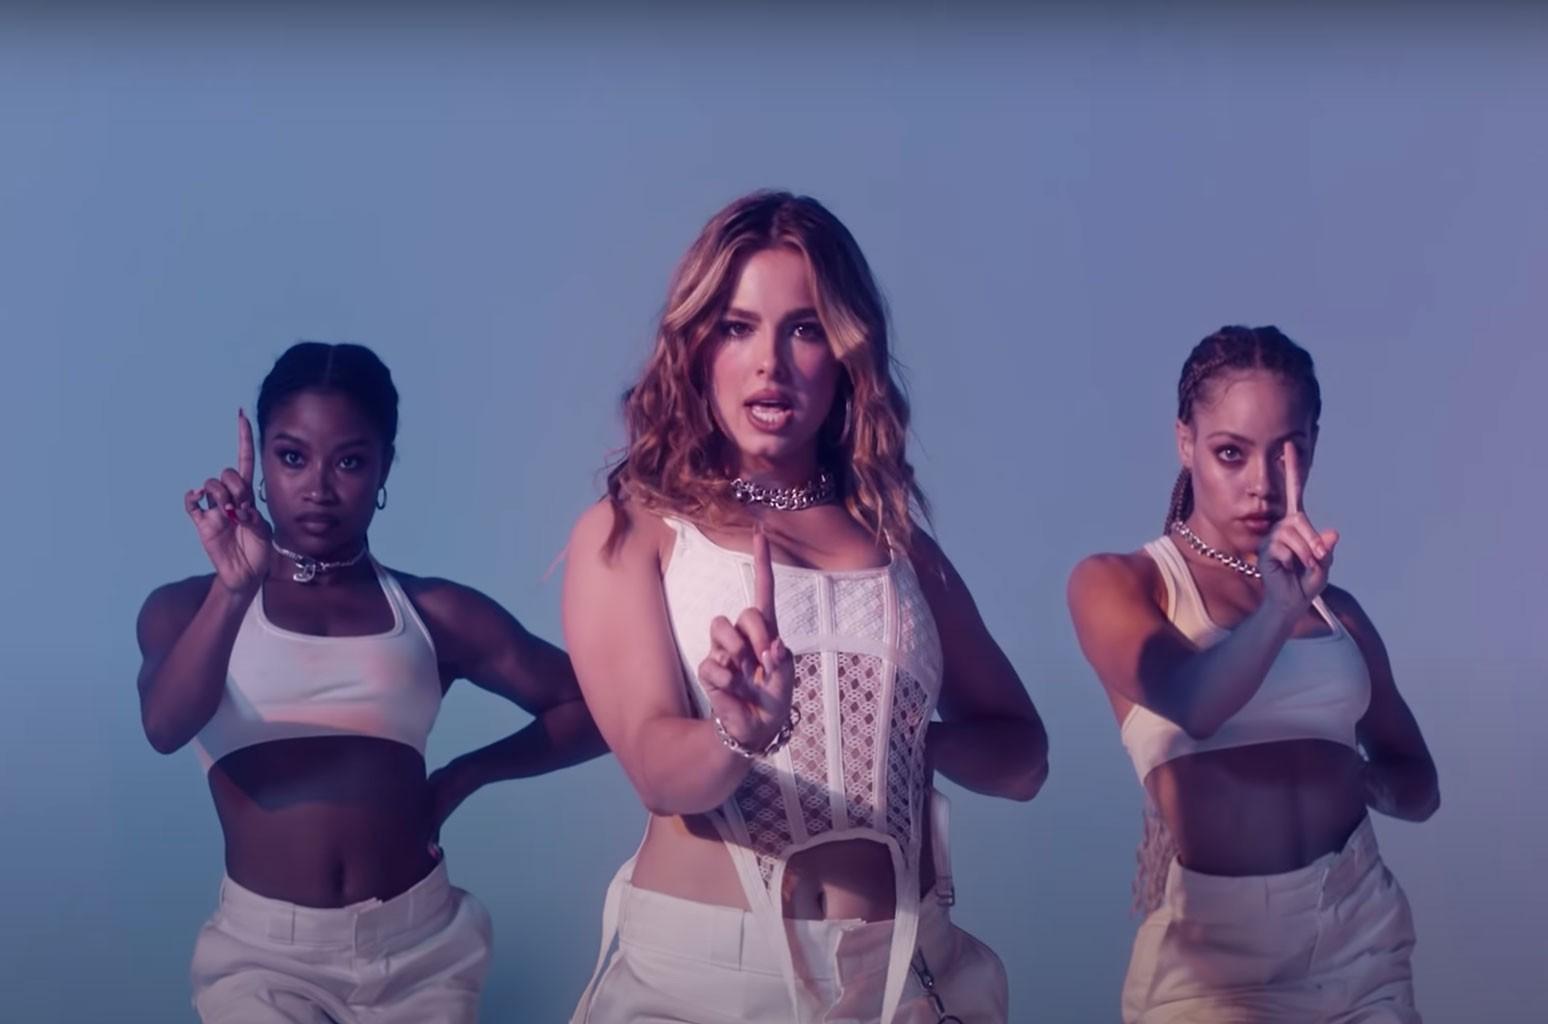 Addison Rae 'Obsessed' Single & Video: Watch | Billboard